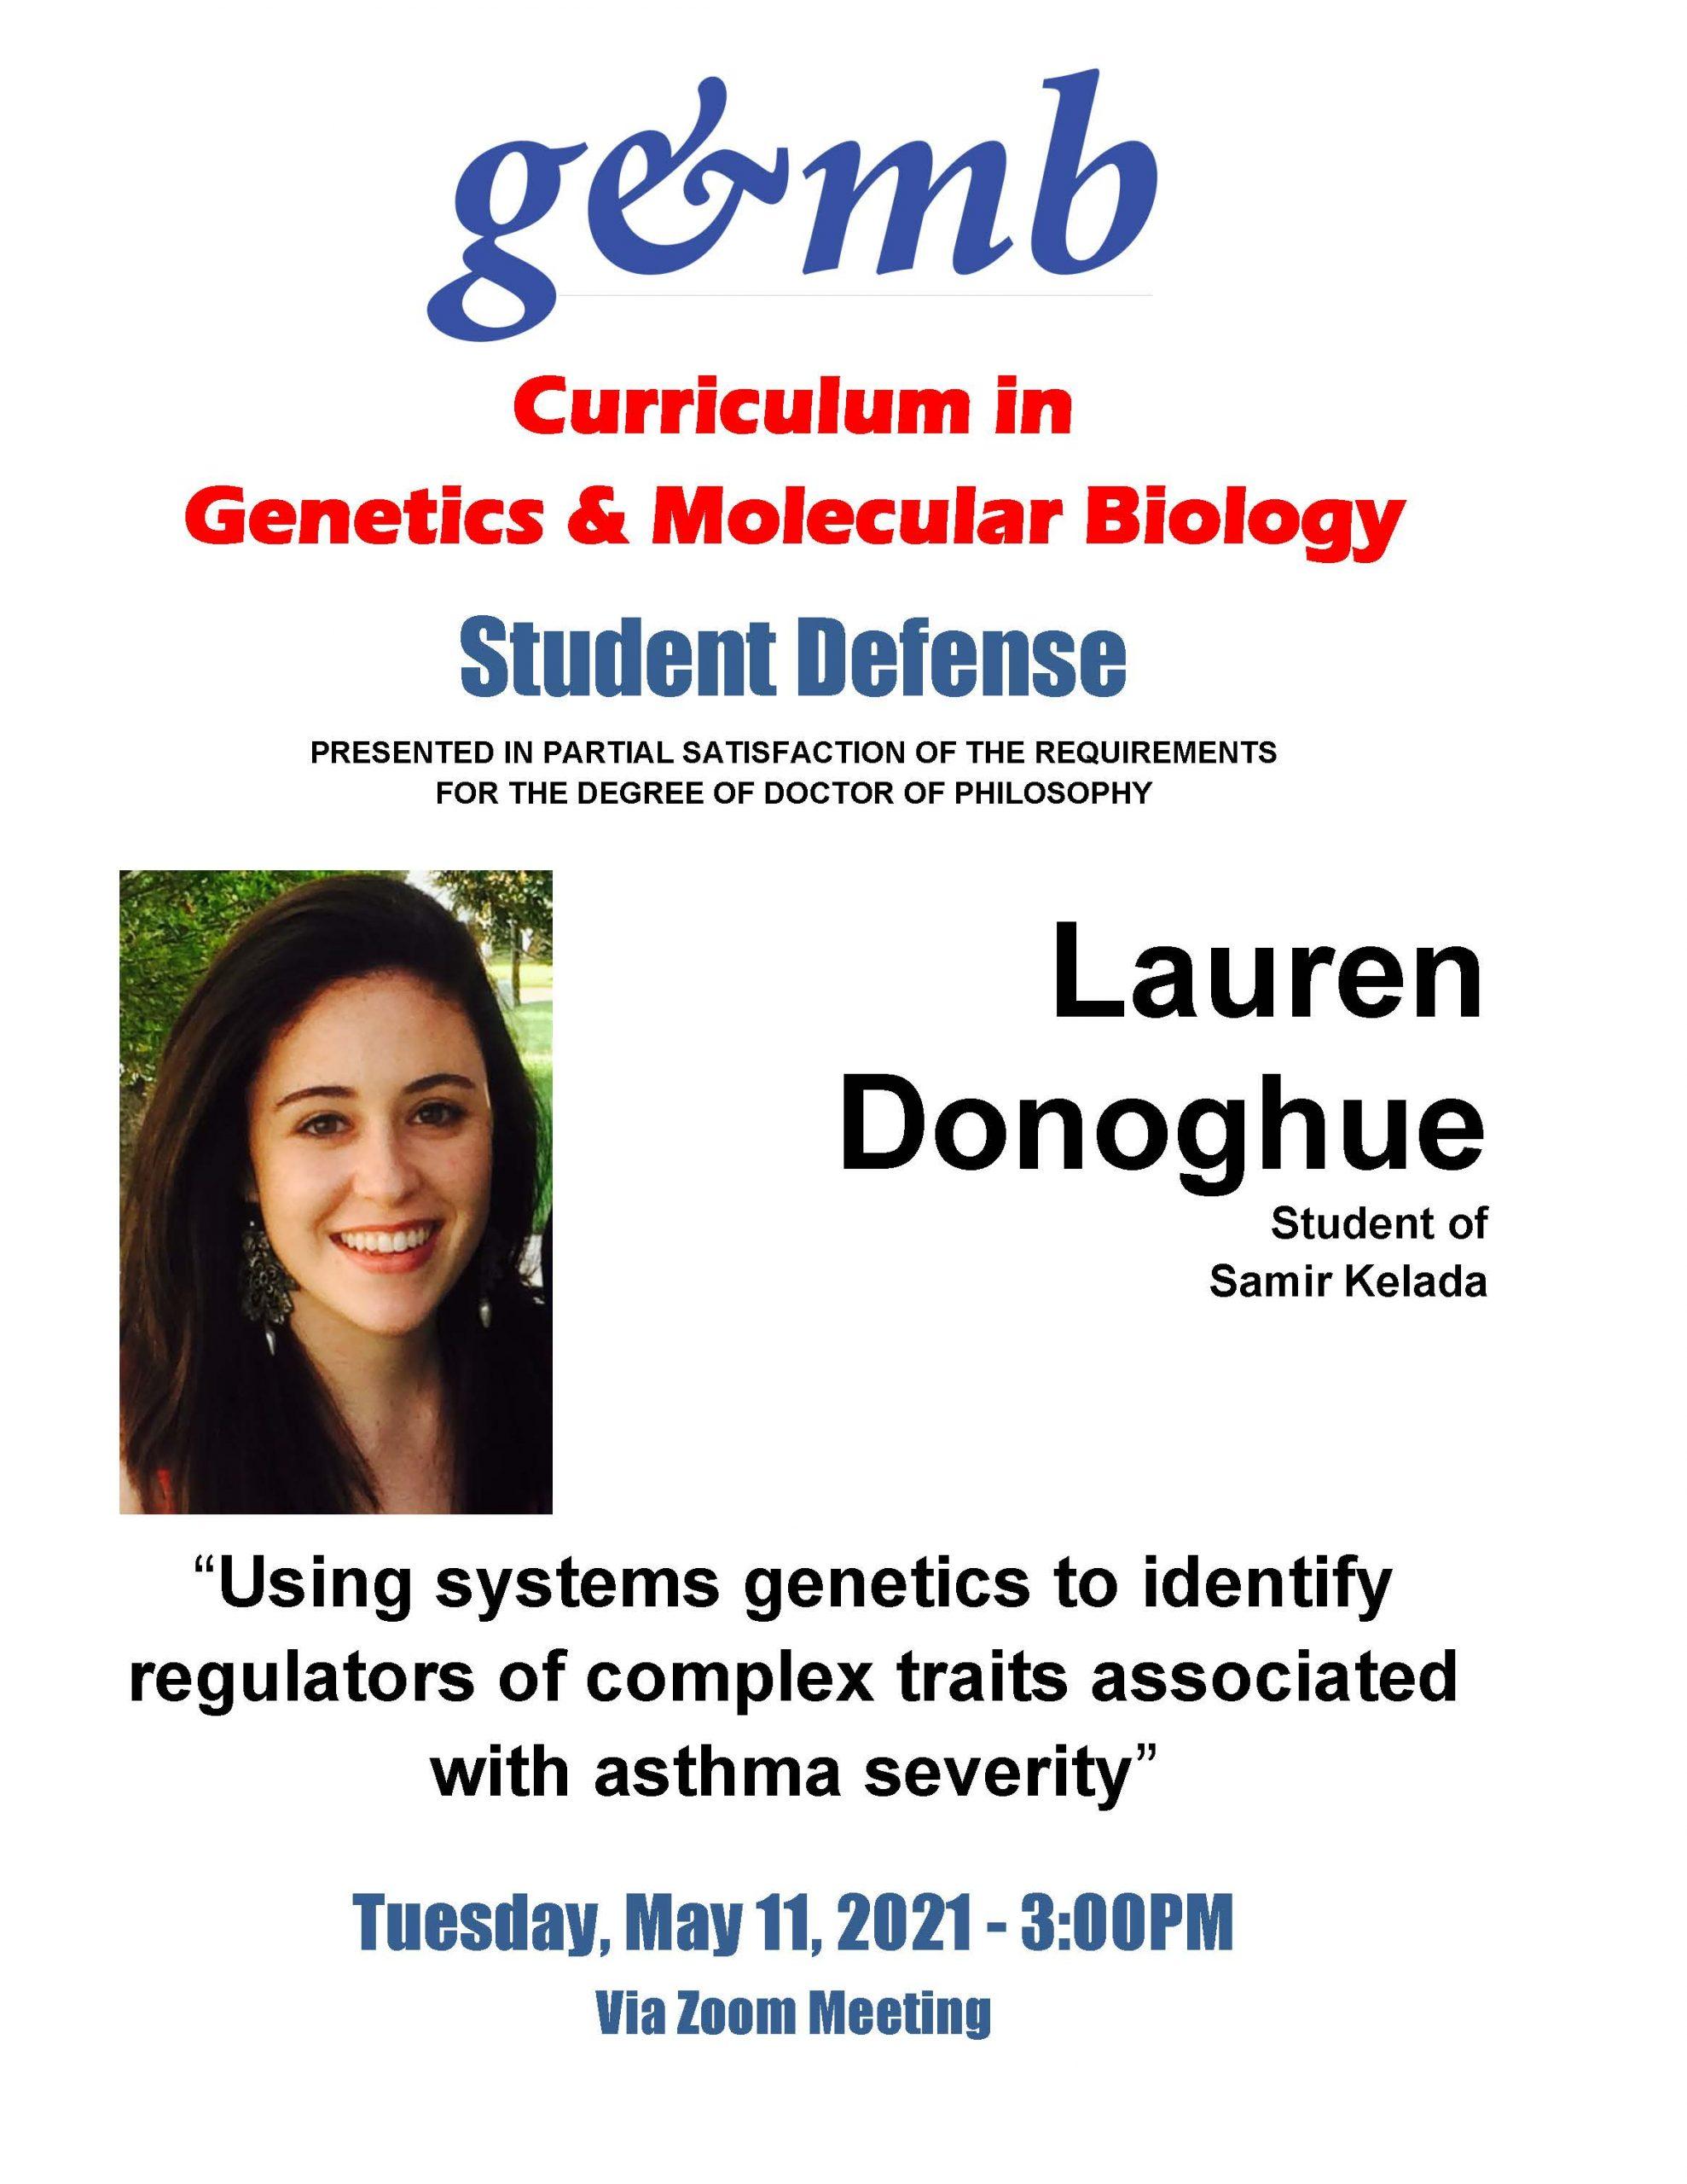 Donoghue_Lauren Defense Announcement 21 0511